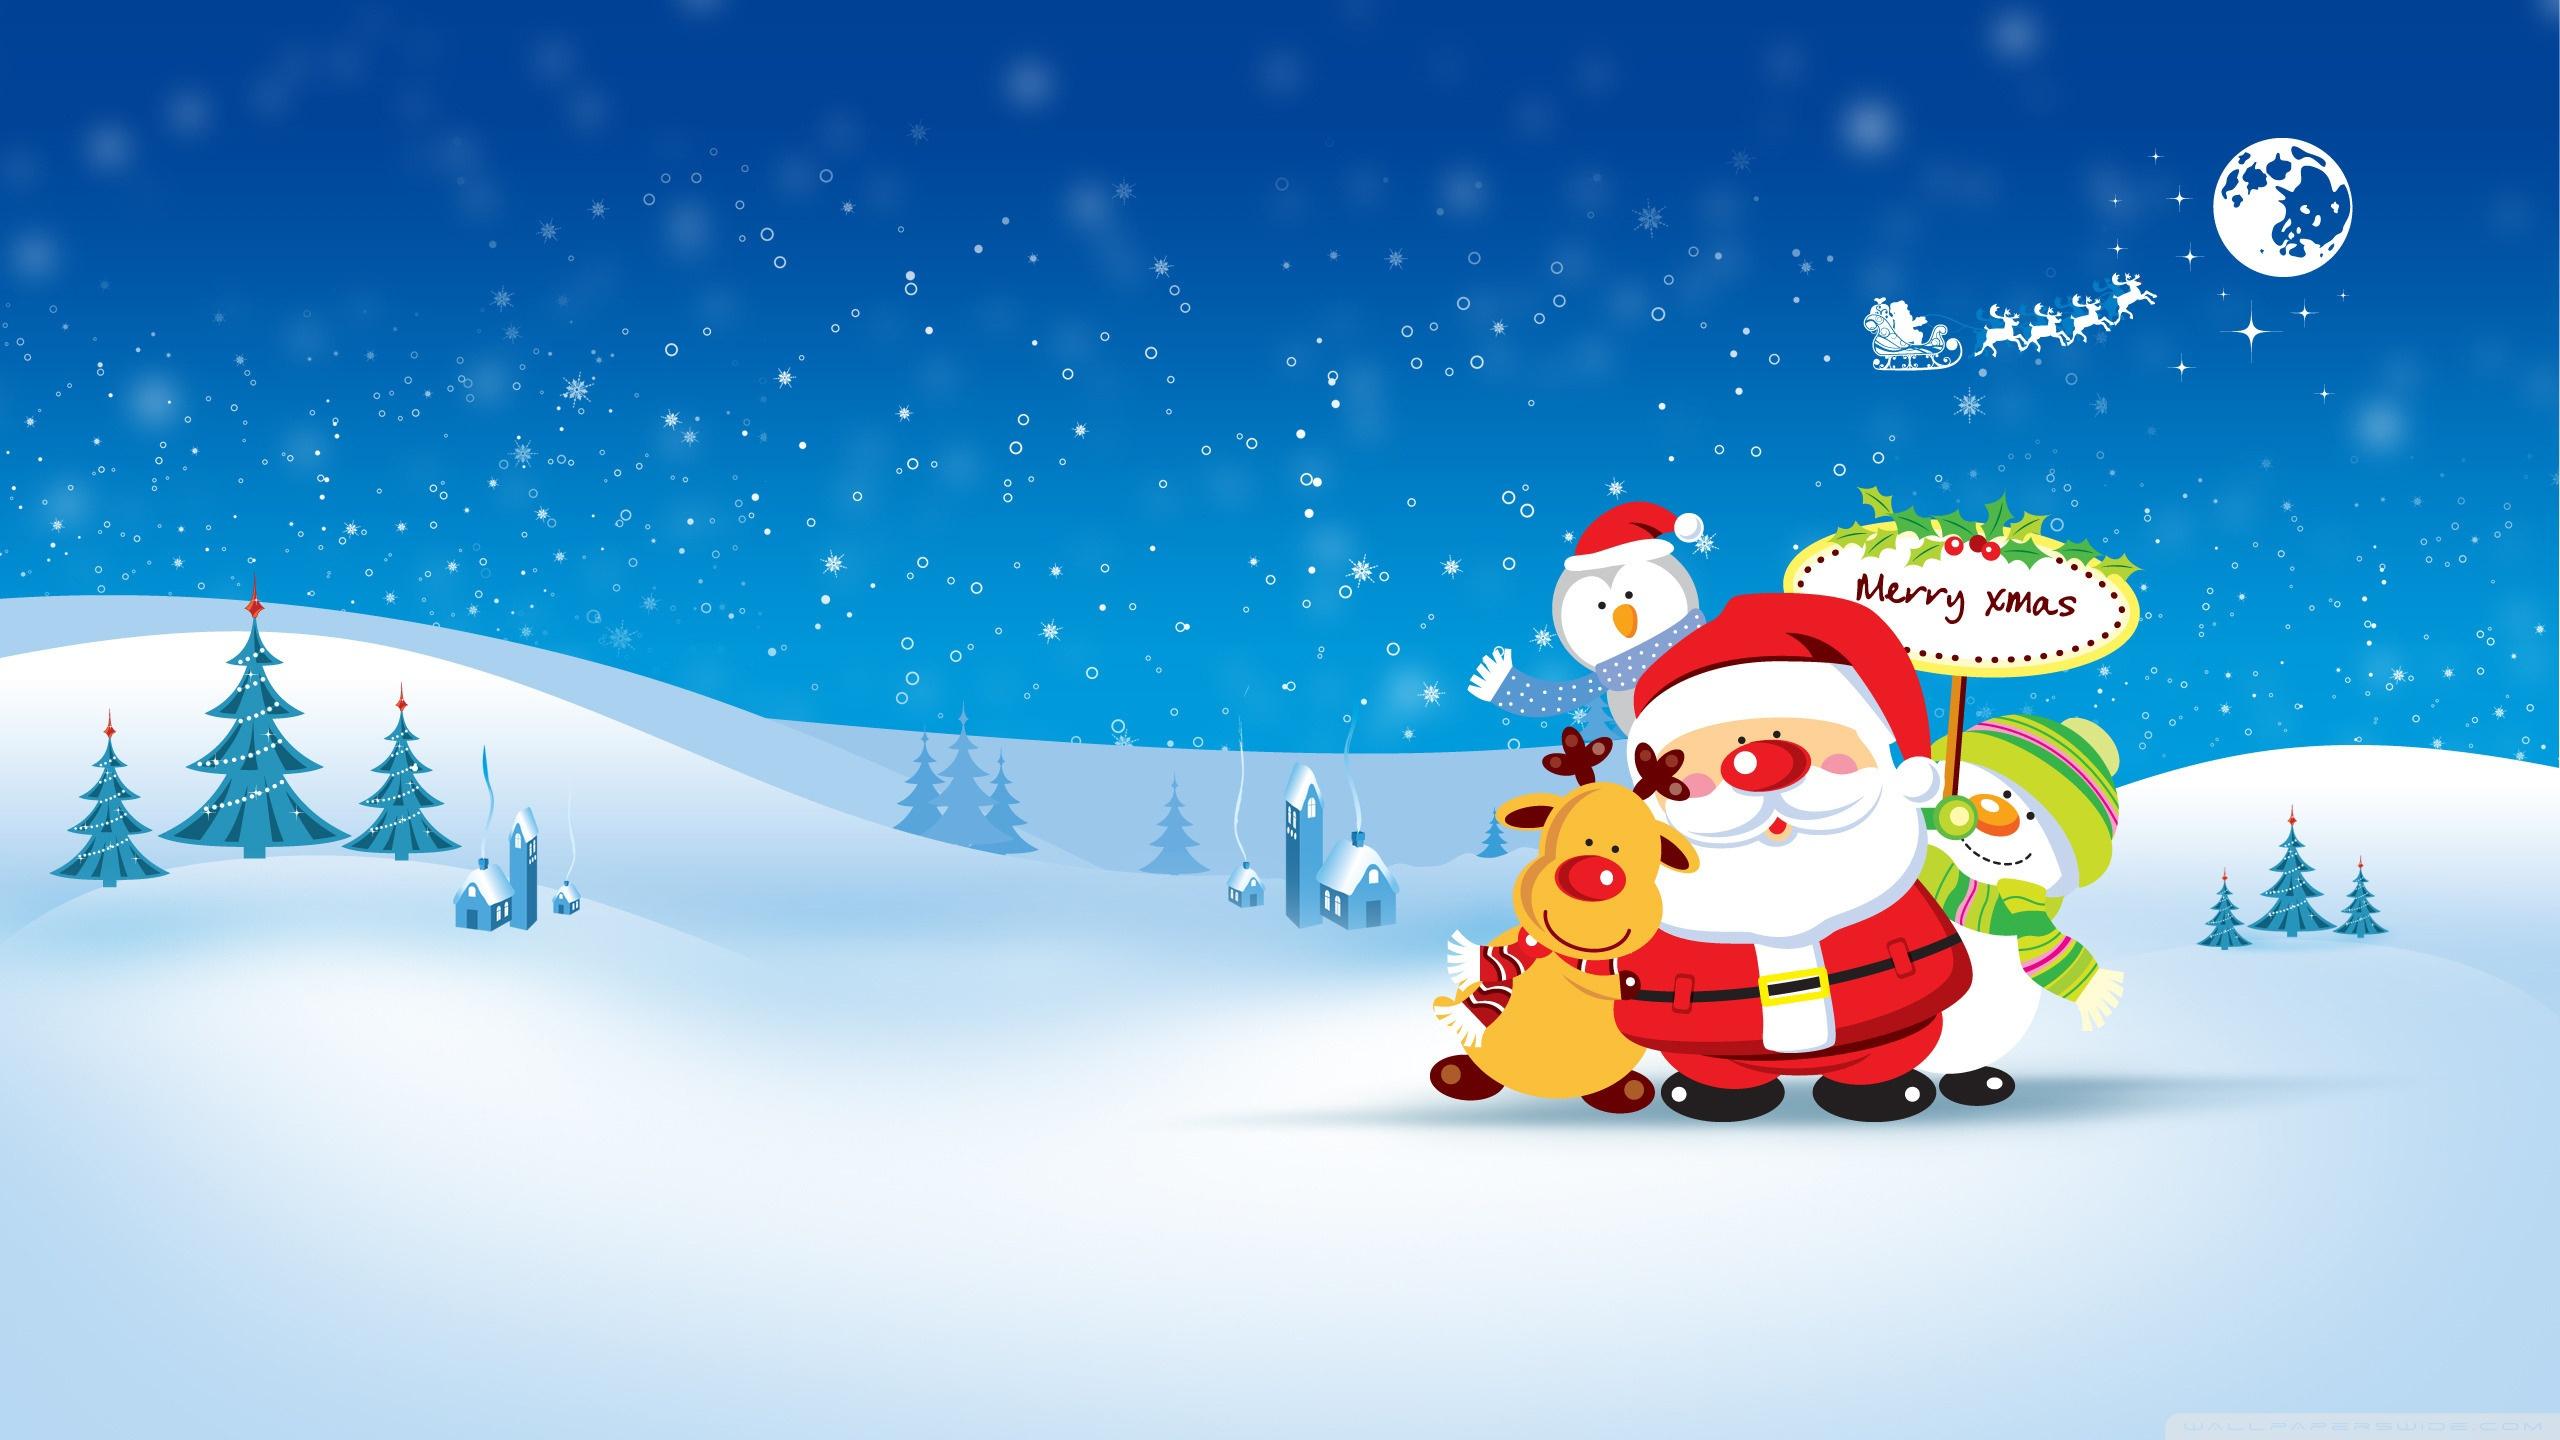 Free Download Merry Xmas 4k Hd Desktop Wallpaper For Dual Monitor Desktops 2560x1440 For Your Desktop Mobile Tablet Explore 52 Merry Christmas Wallpapers Christmas Wallpapers For Desktop Free Christmas